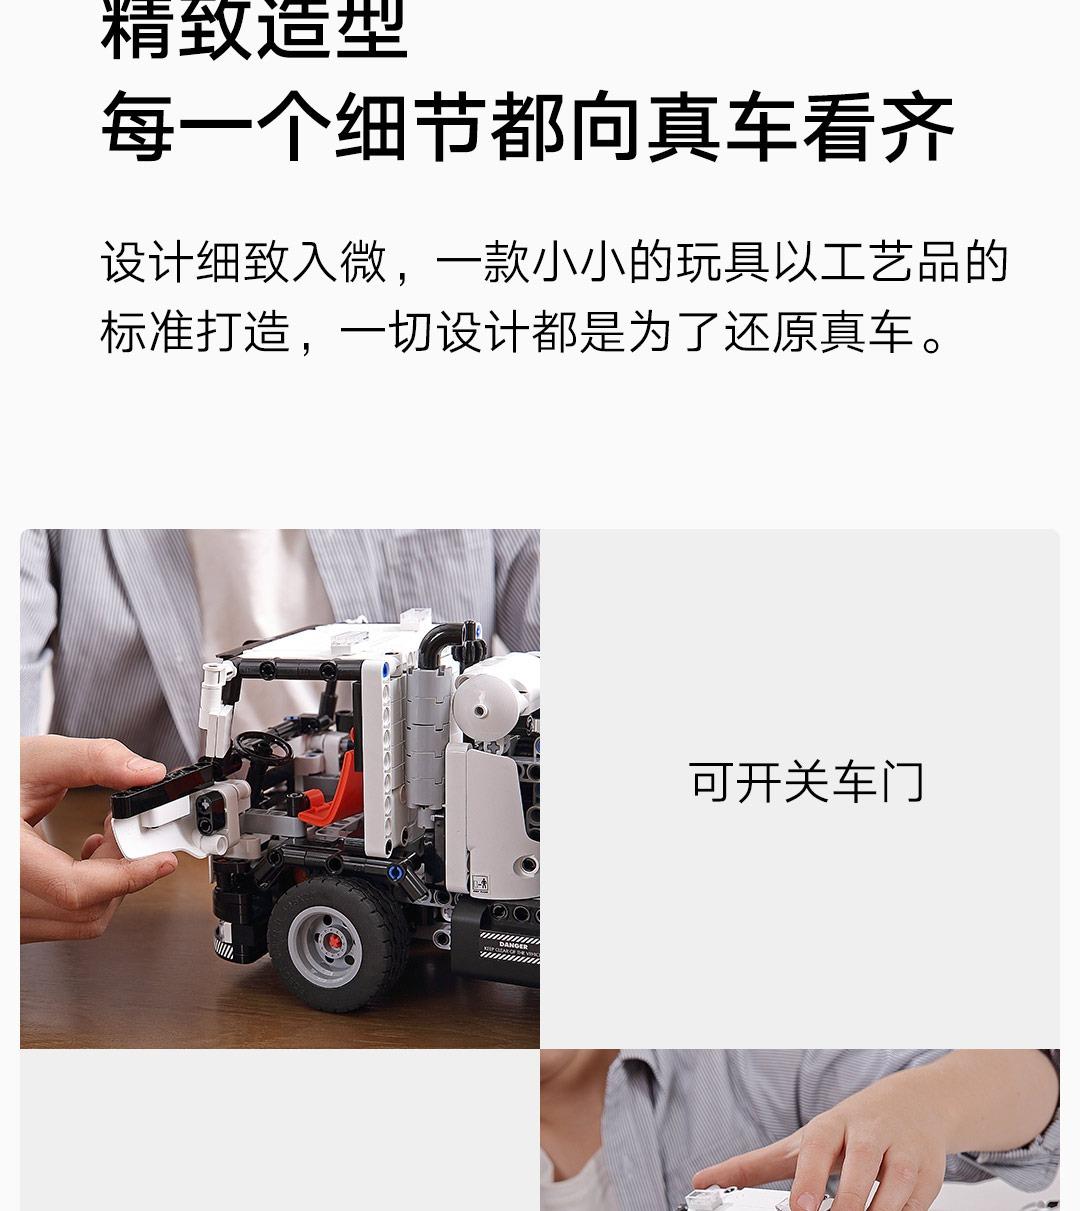 product_奇妙_小米工程搅拌车